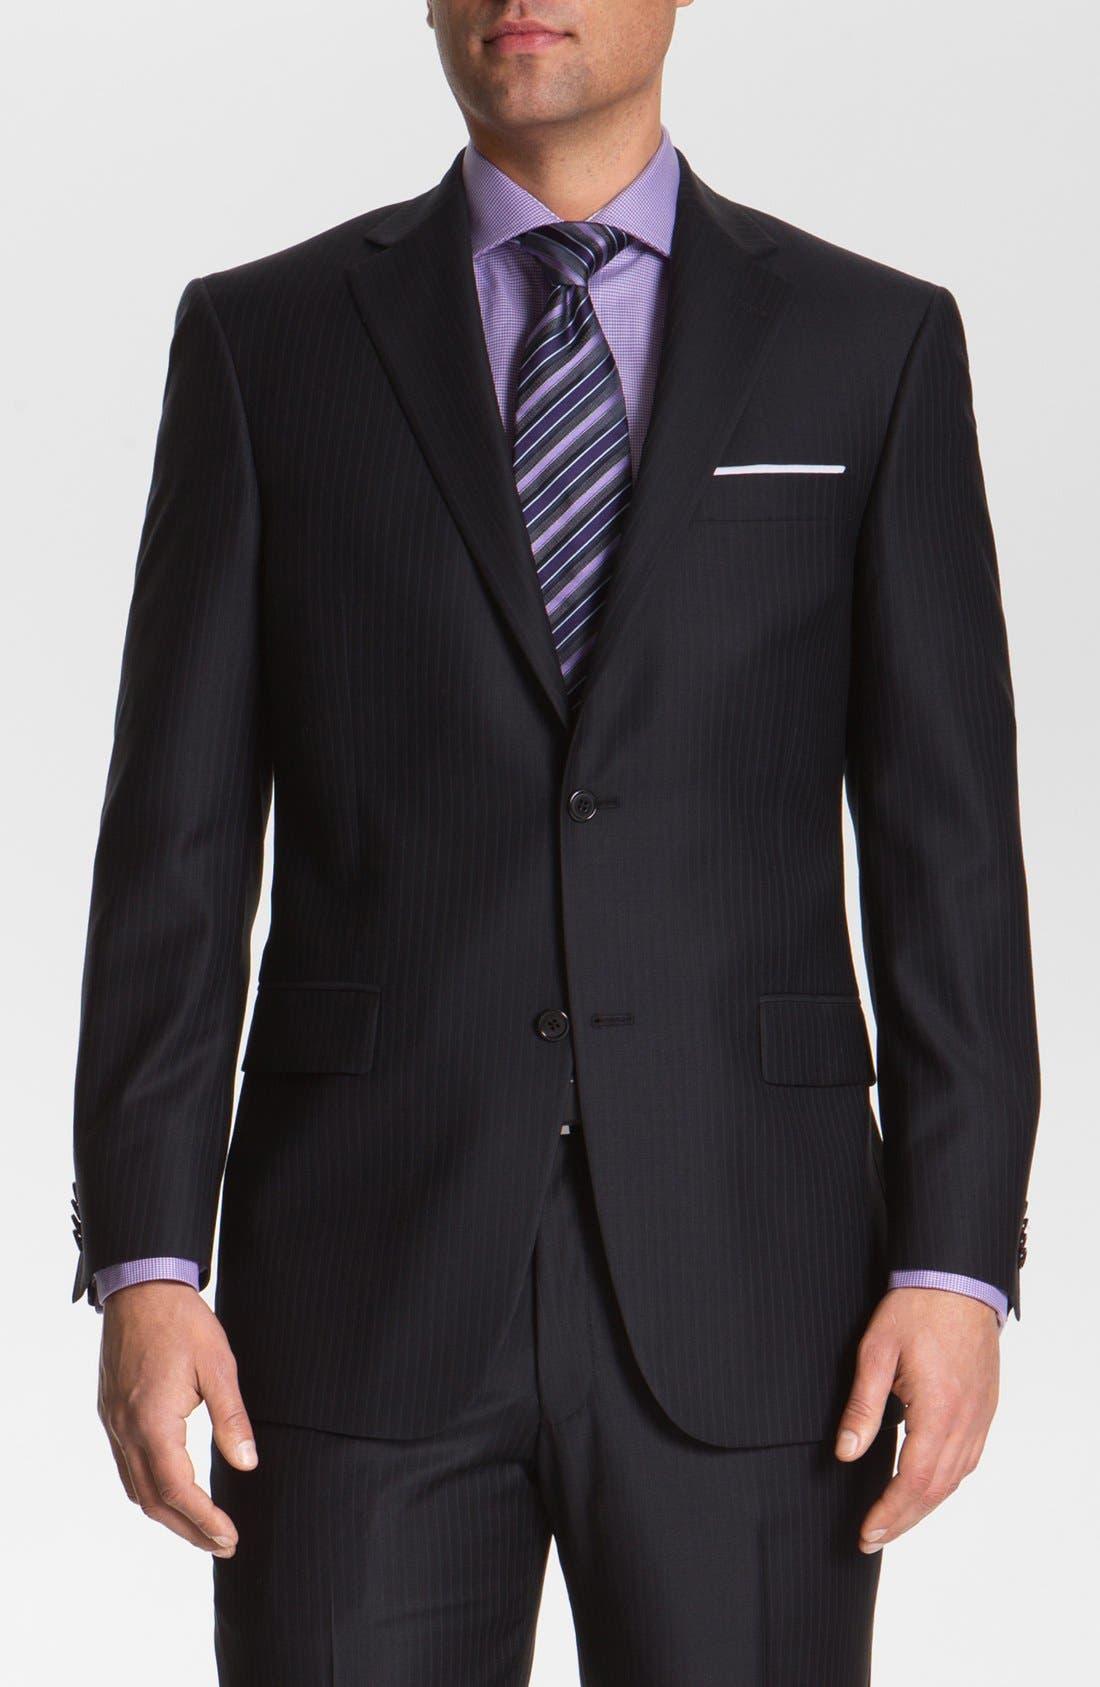 Main Image - Hart Schaffner Marx Stripe Wool Suit (Big)